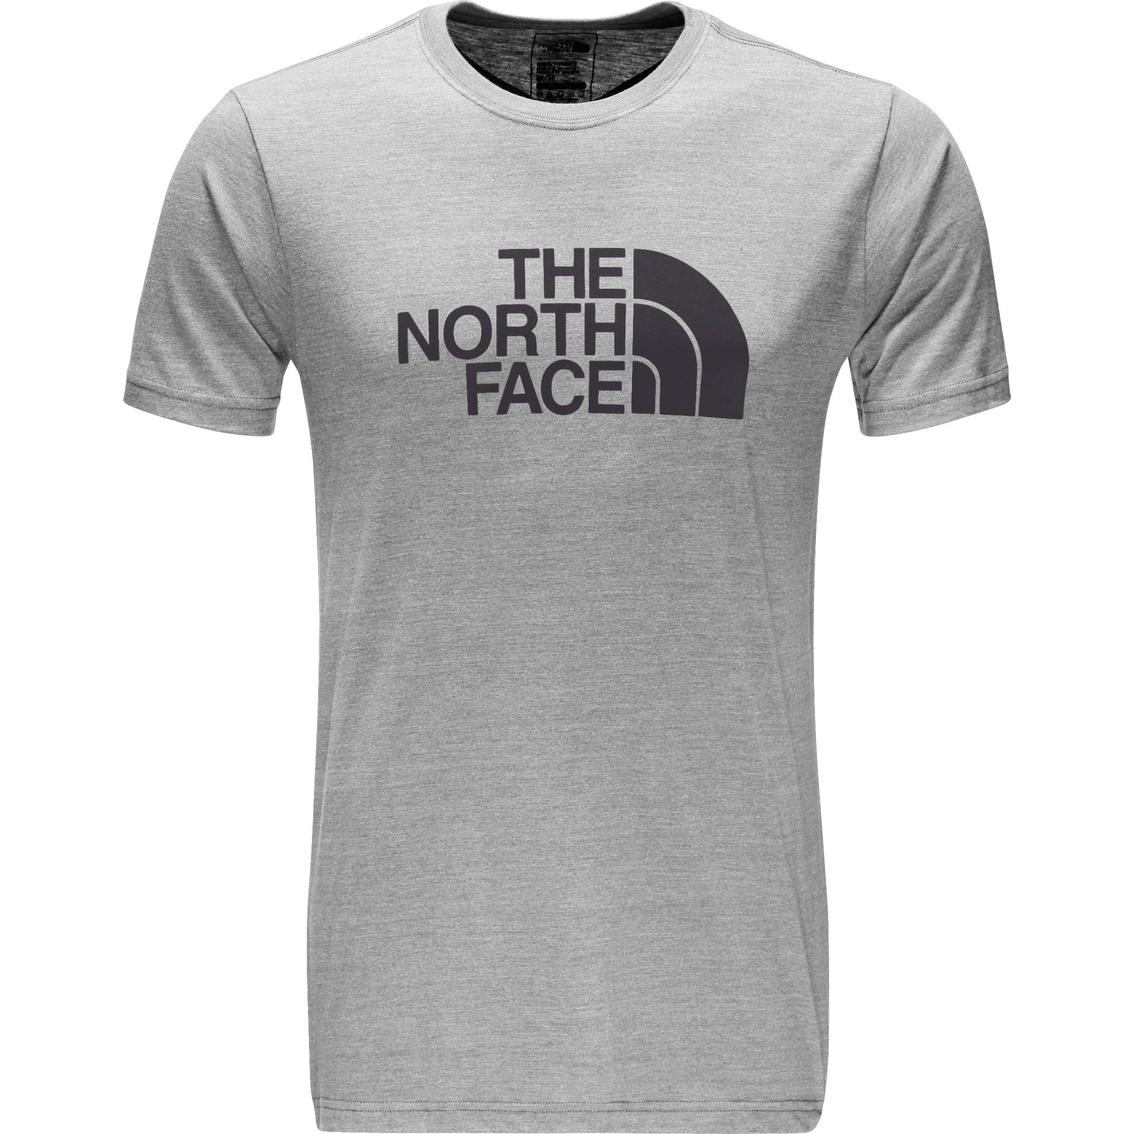 ff787f64 The North Face Half Dome Tri Blend Tee | T-shirts | Apparel | Shop ...